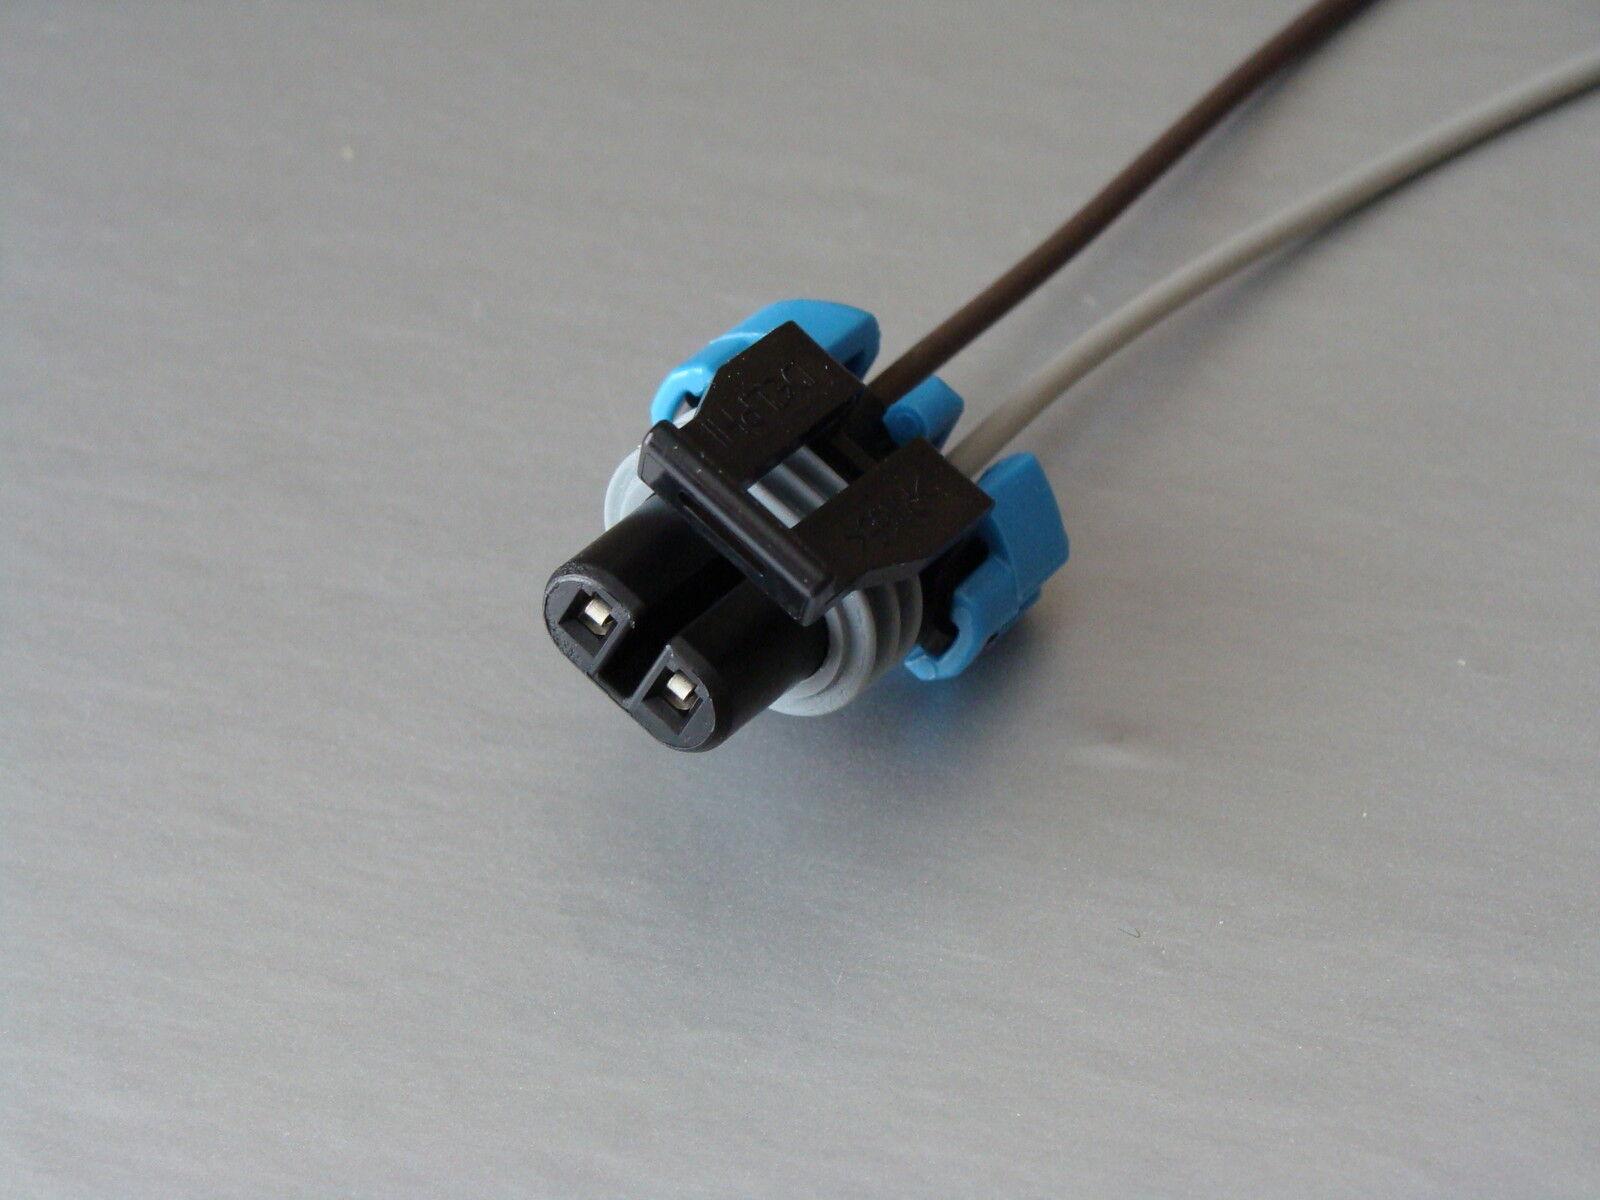 92 97 lt1 camaro trans am corvette egr solenoid wiring harness rh ebay com 93 LT1 Wiring Harness 1994 LT1 Wiring Harness